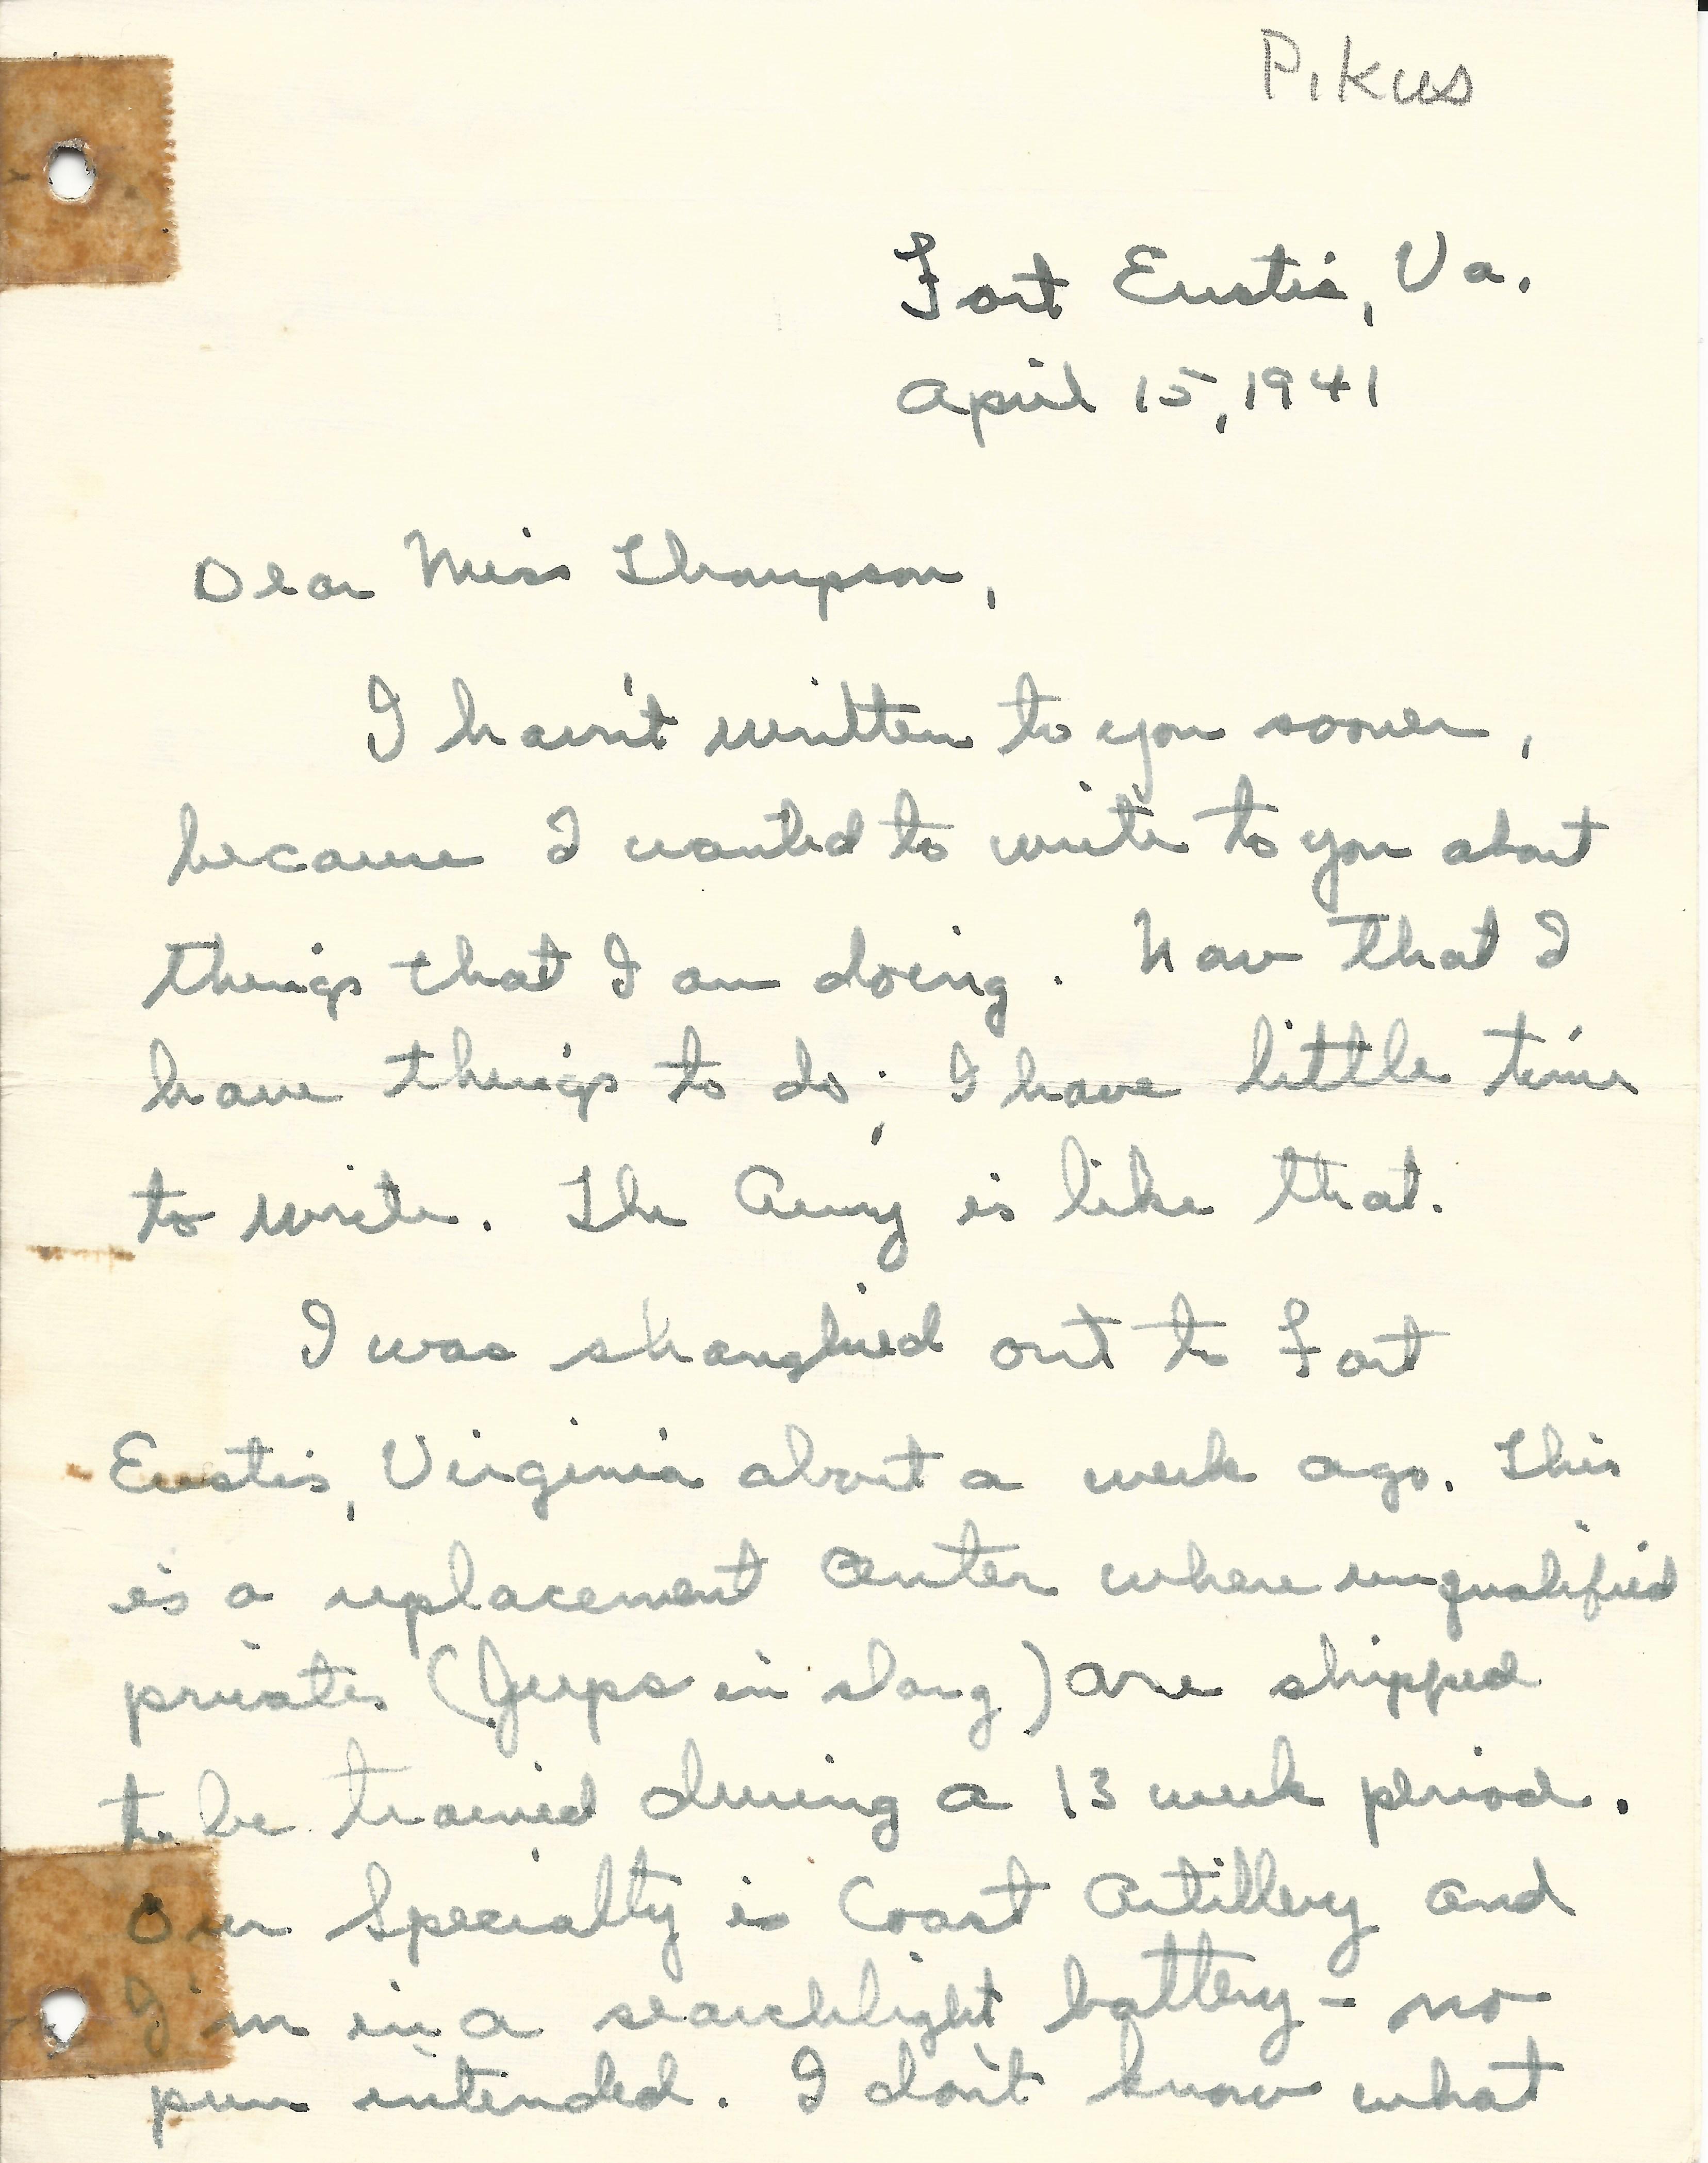 Joseph Pikus April 15 1941